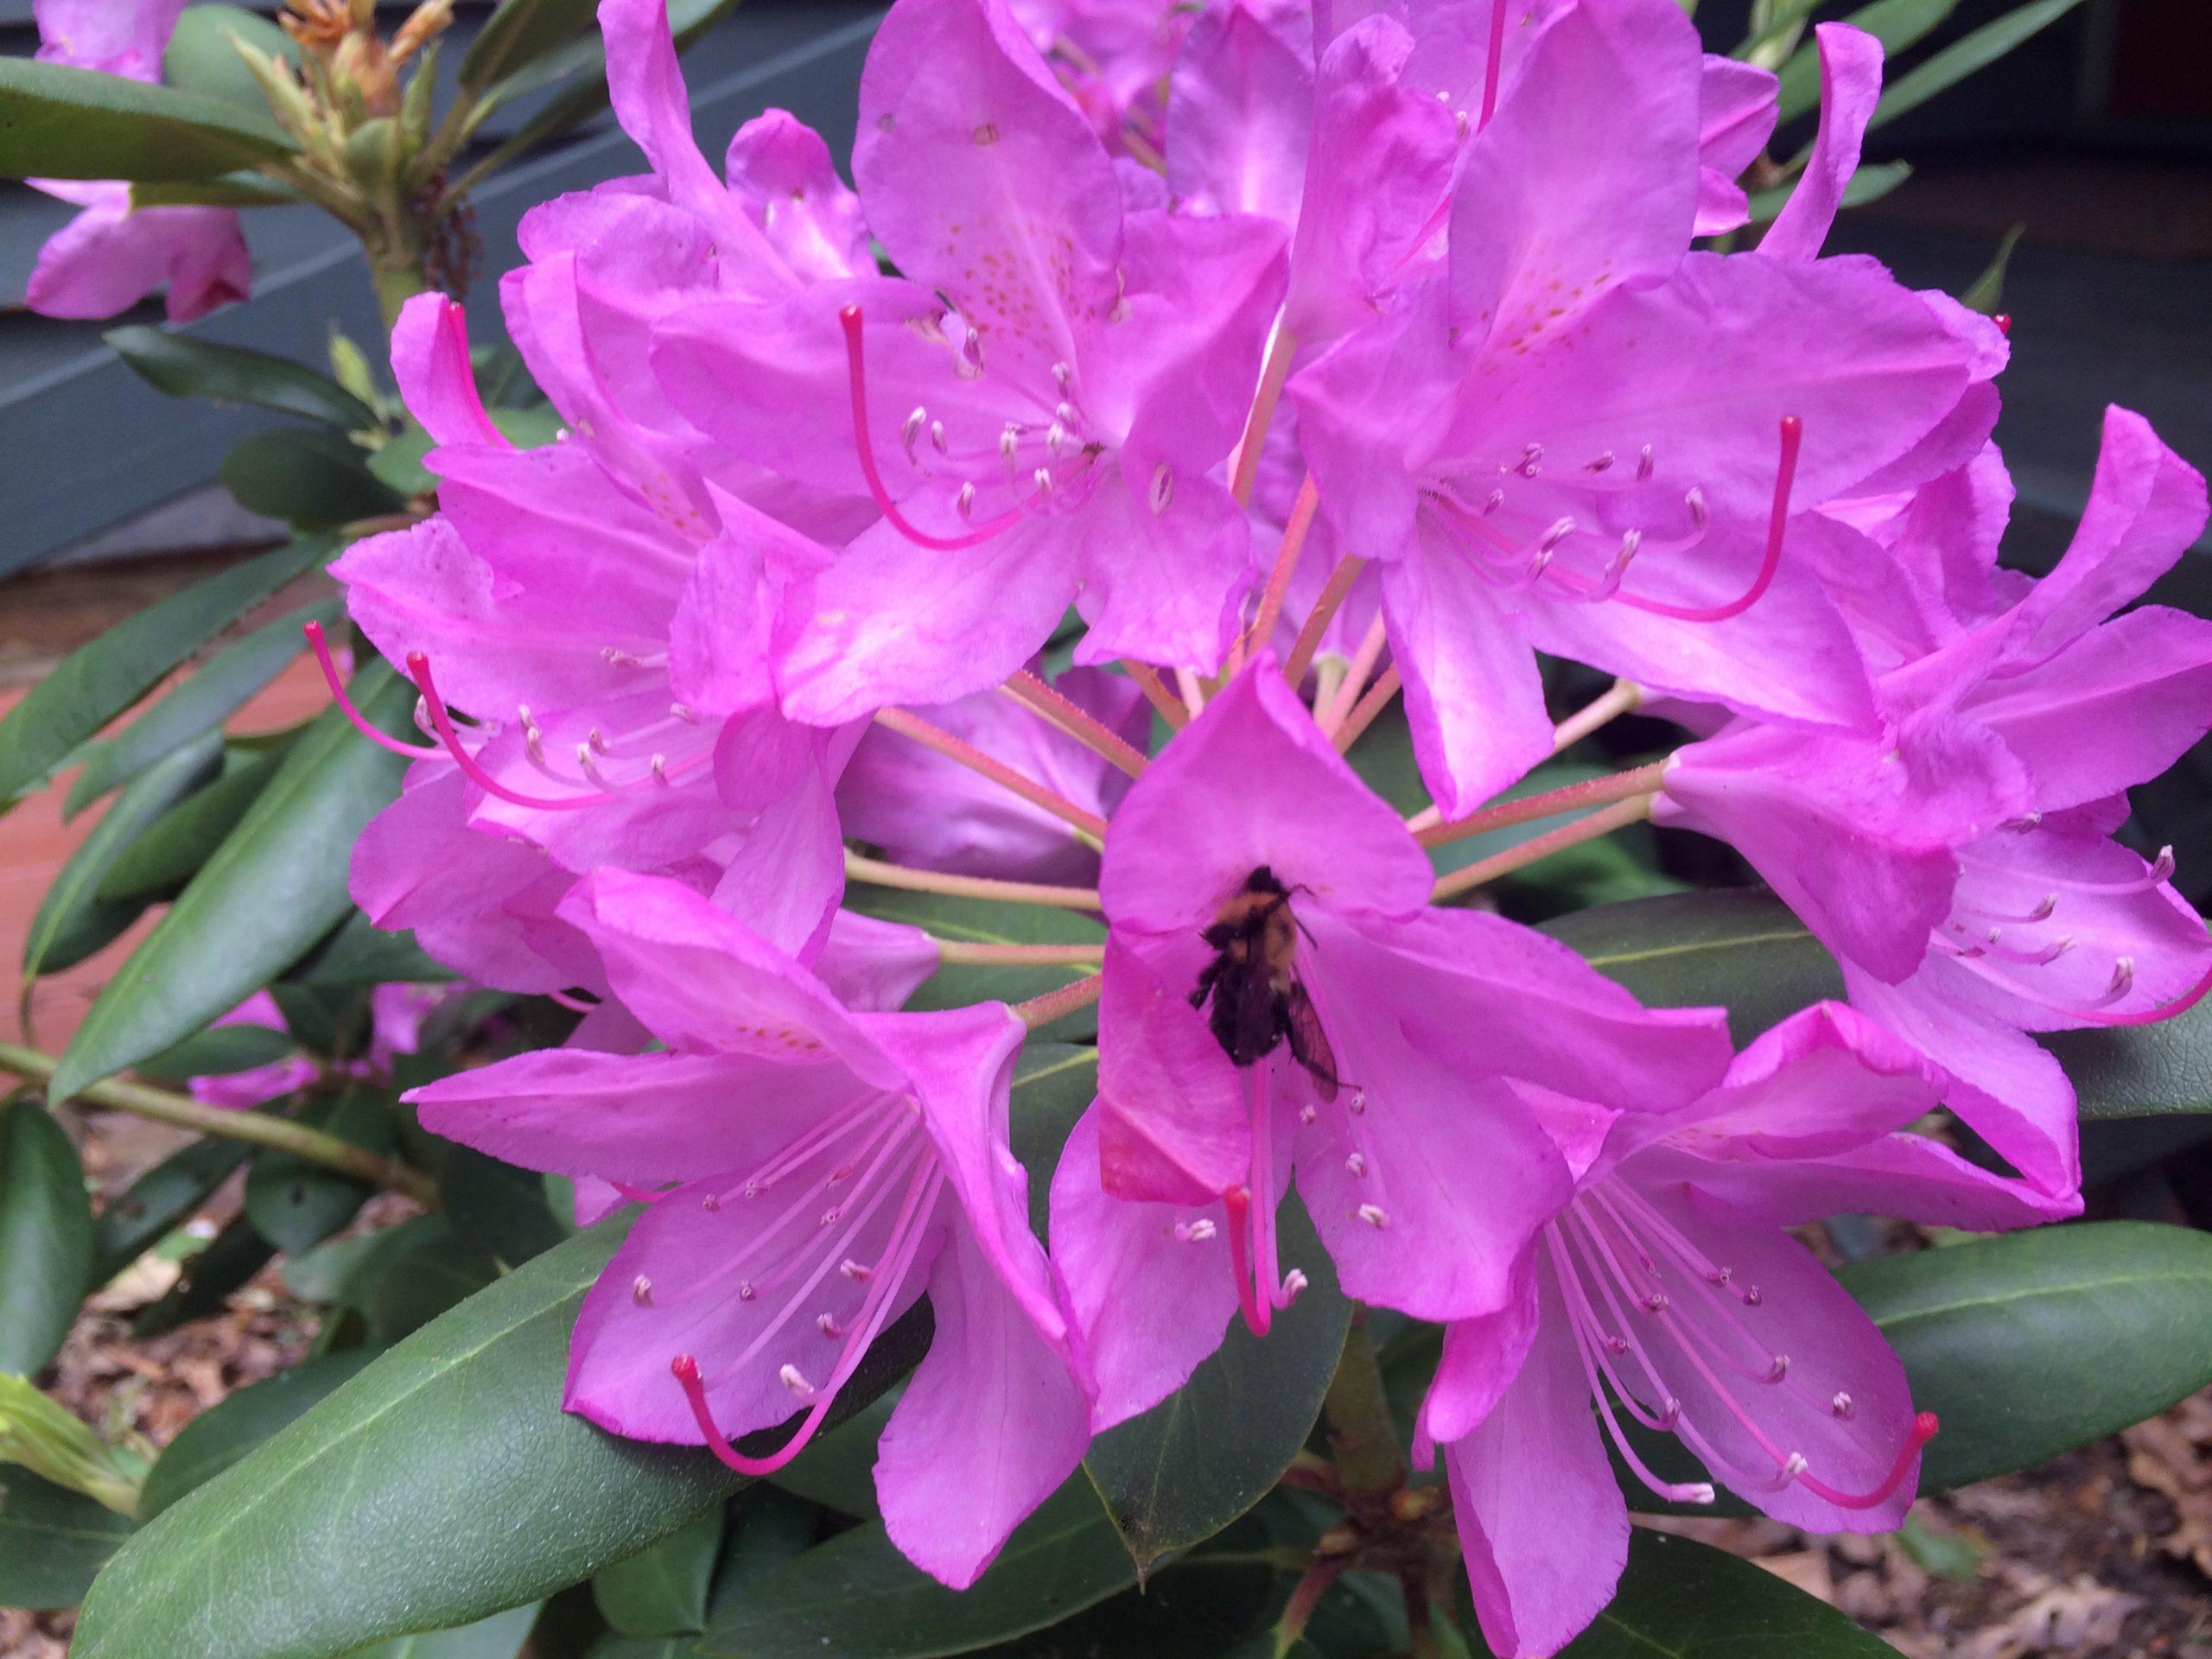 Native Shrubs and Perennials for Your Yard or Garden